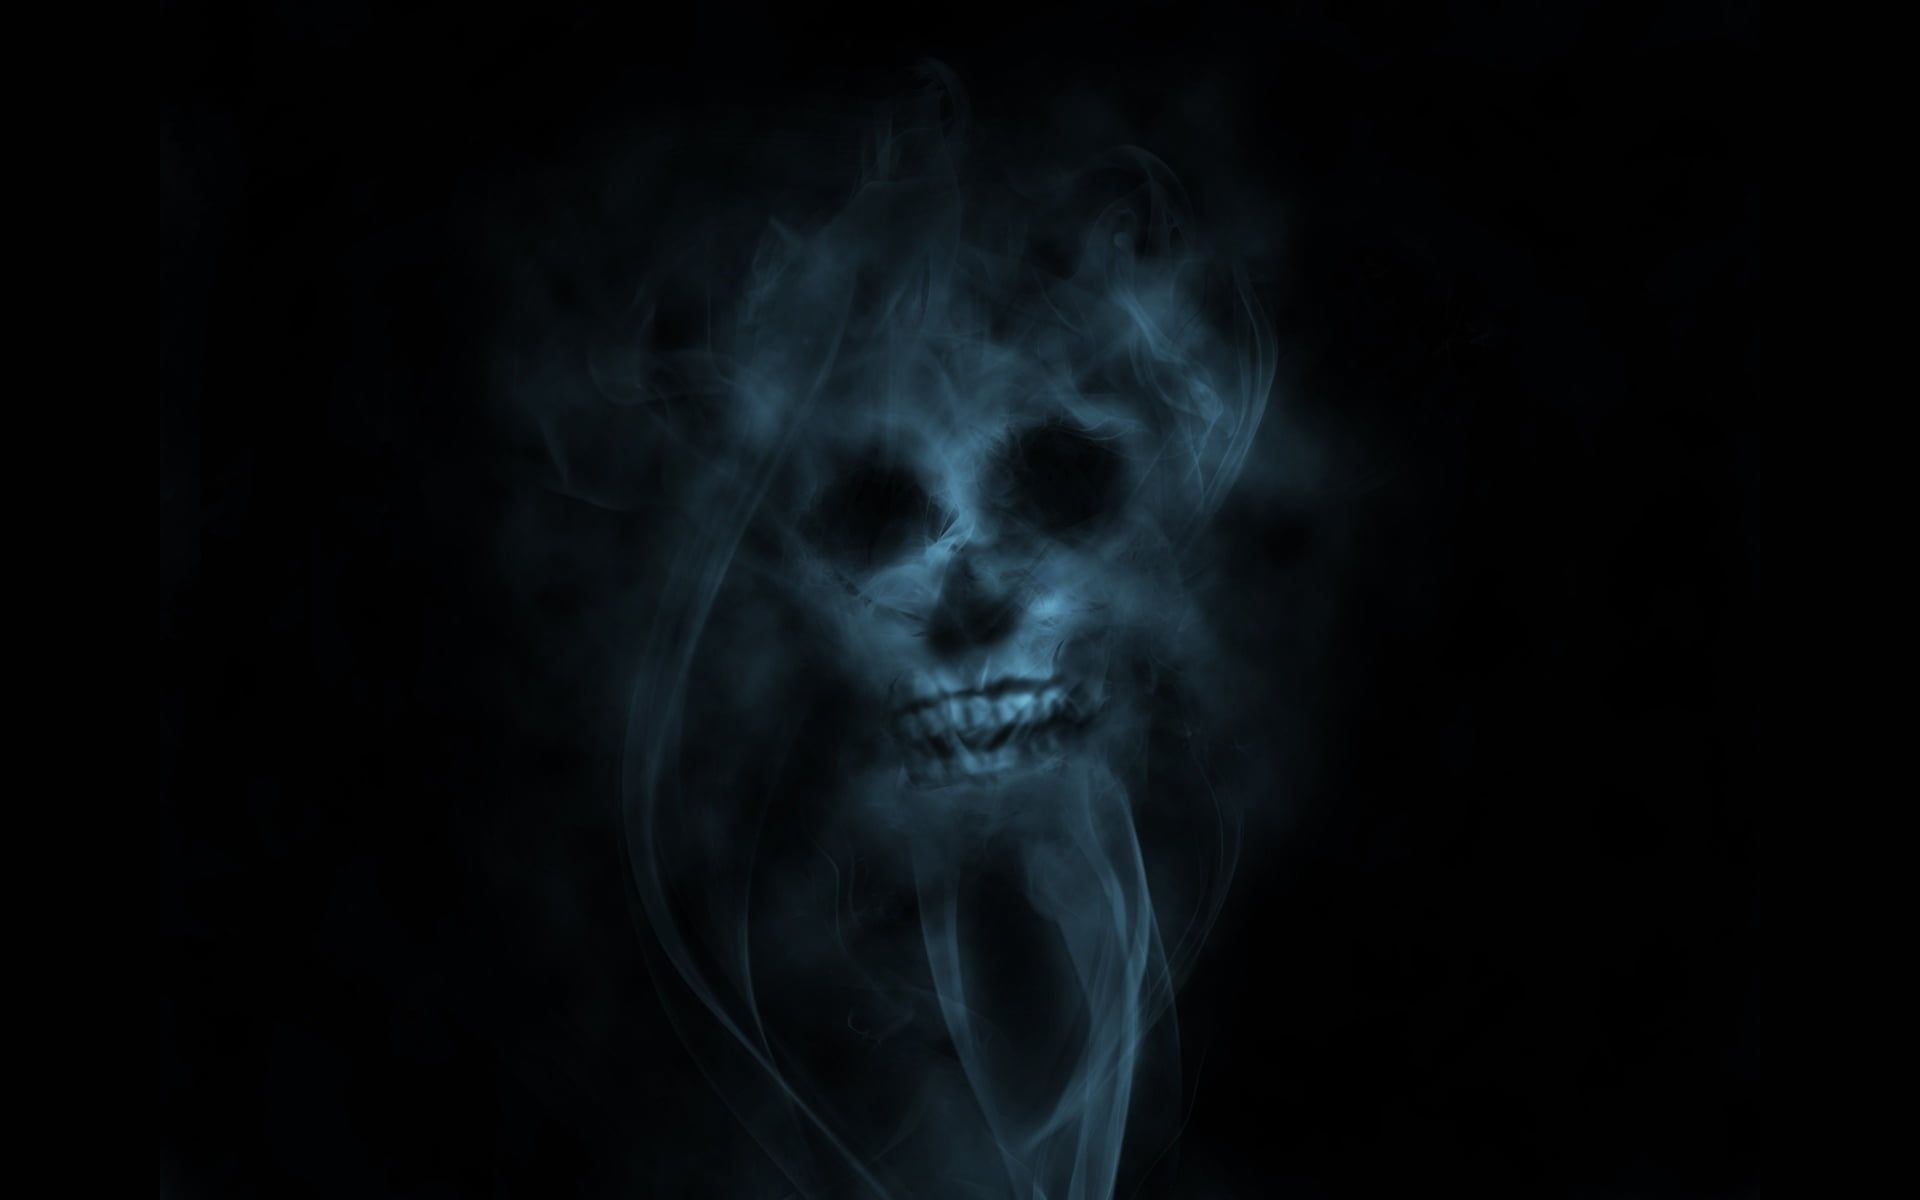 3d Guns Live Wallpaper Full Apk Smoking Skull Wallpapers Top Free Smoking Skull